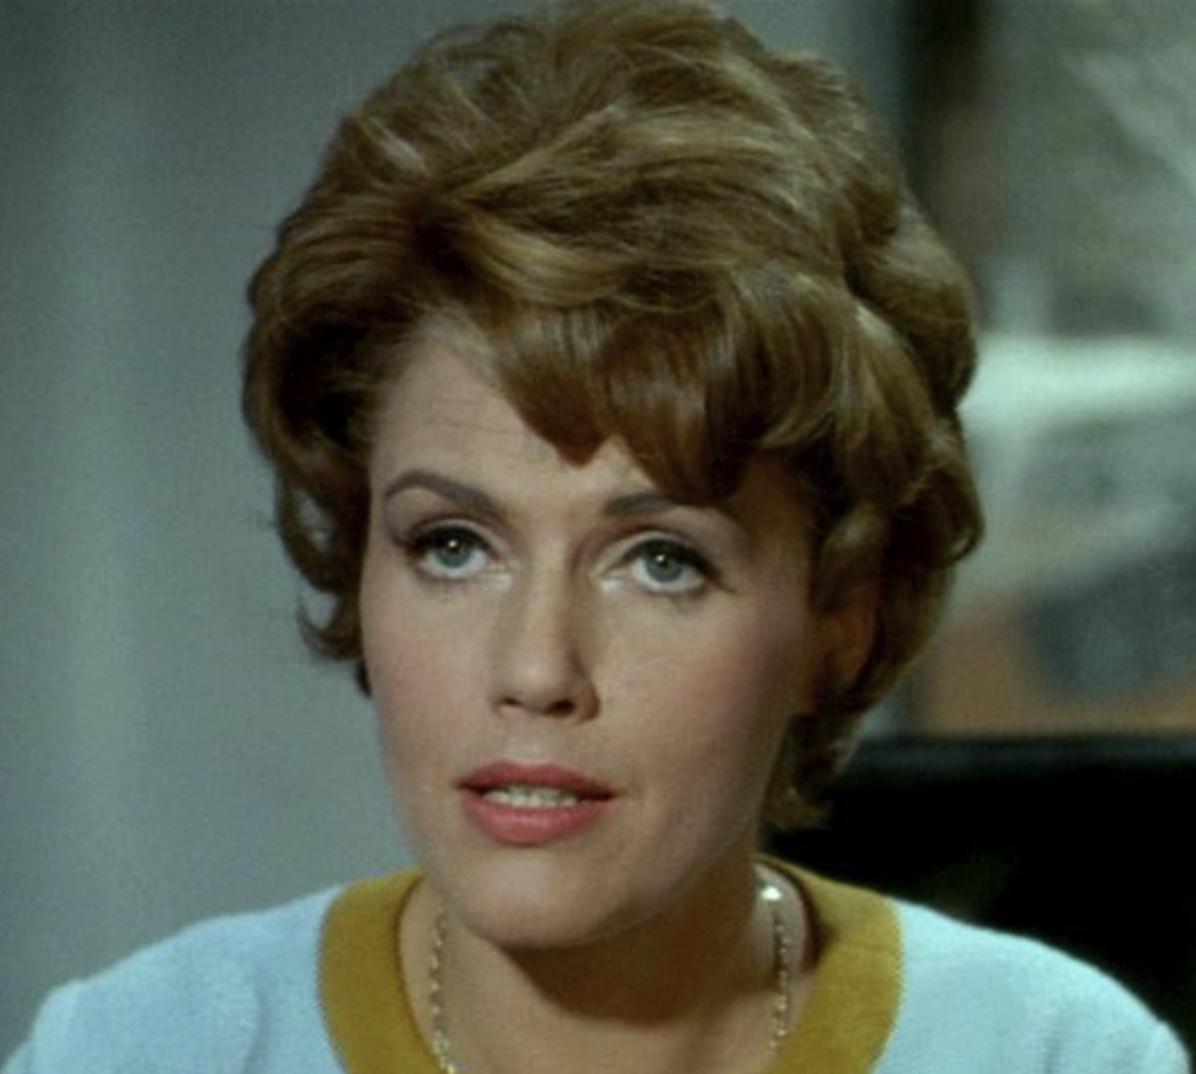 Carla Drosten (The Man From U.N.C.L.E.)